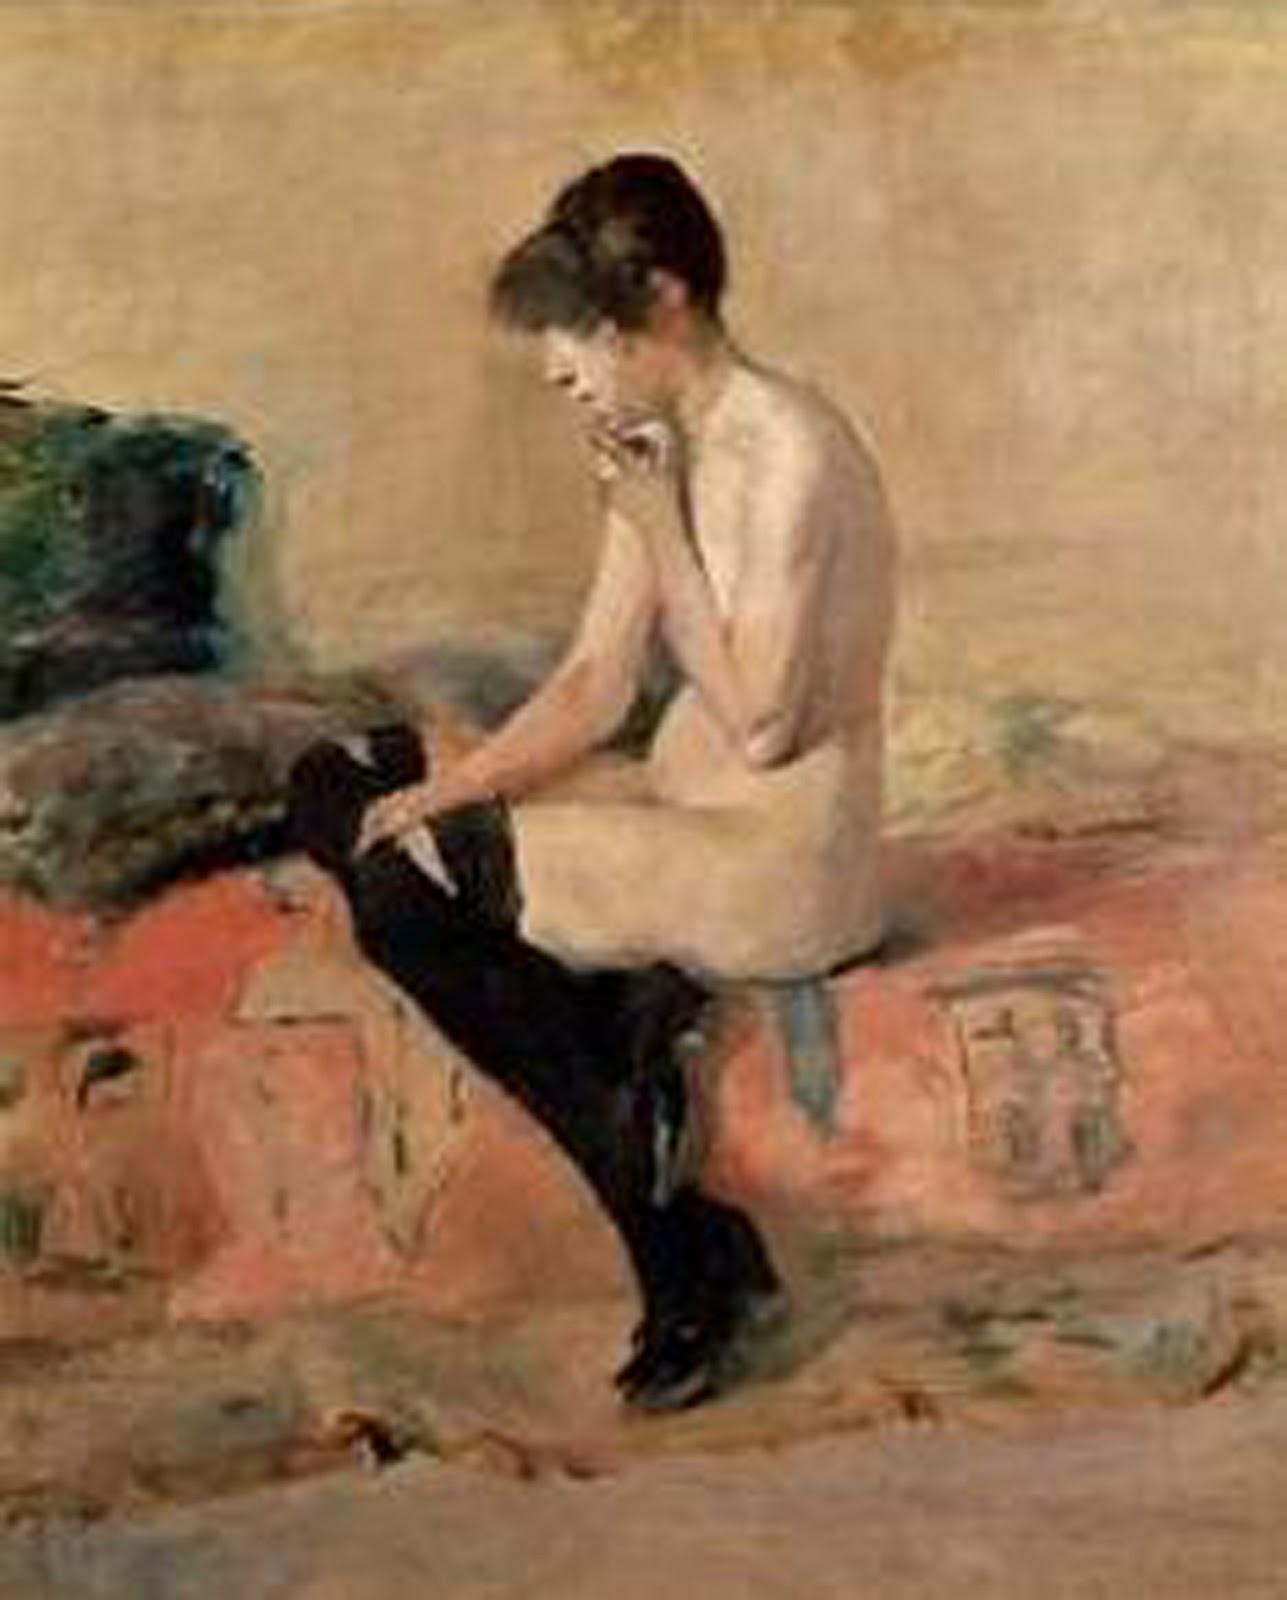 prostitutas toulouse lautrec prostitutas argentinas en barcelona